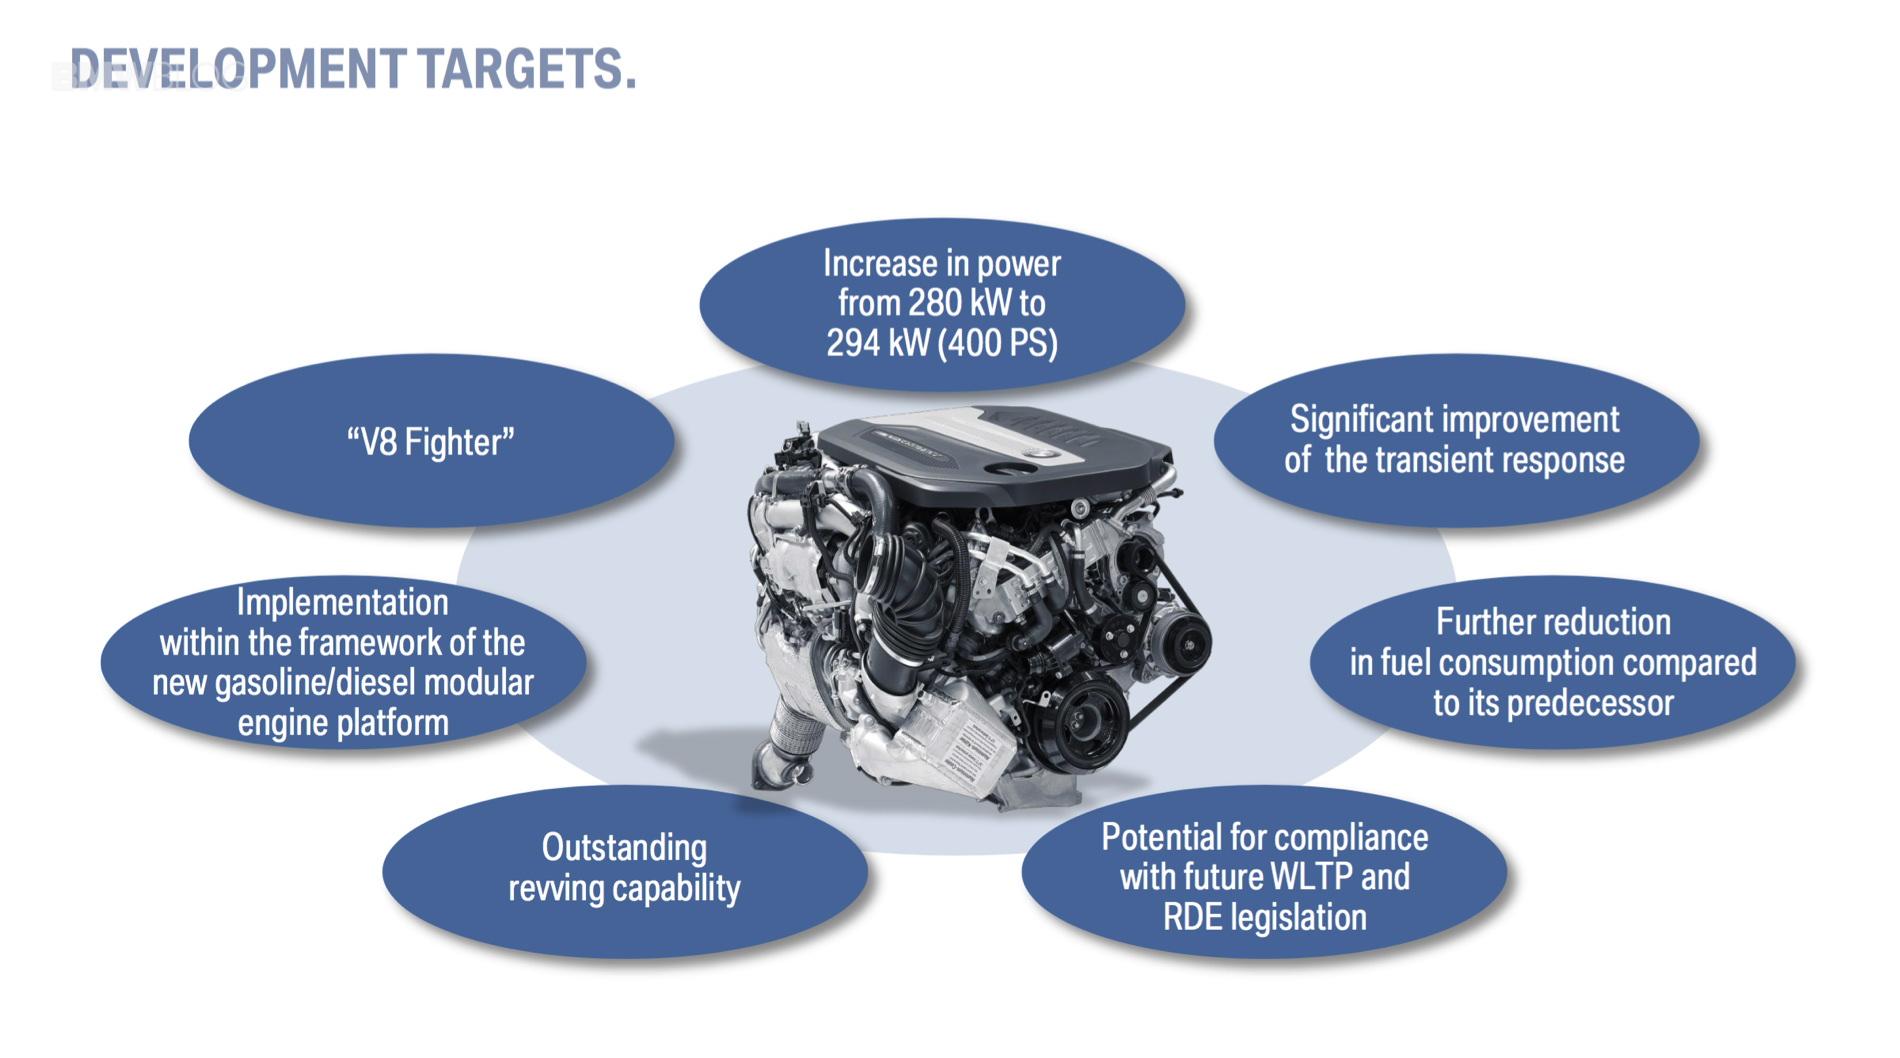 Full Details On The New Bmw Quad Turbo Diesel B57 Engine E66 Diagram 1 750x418